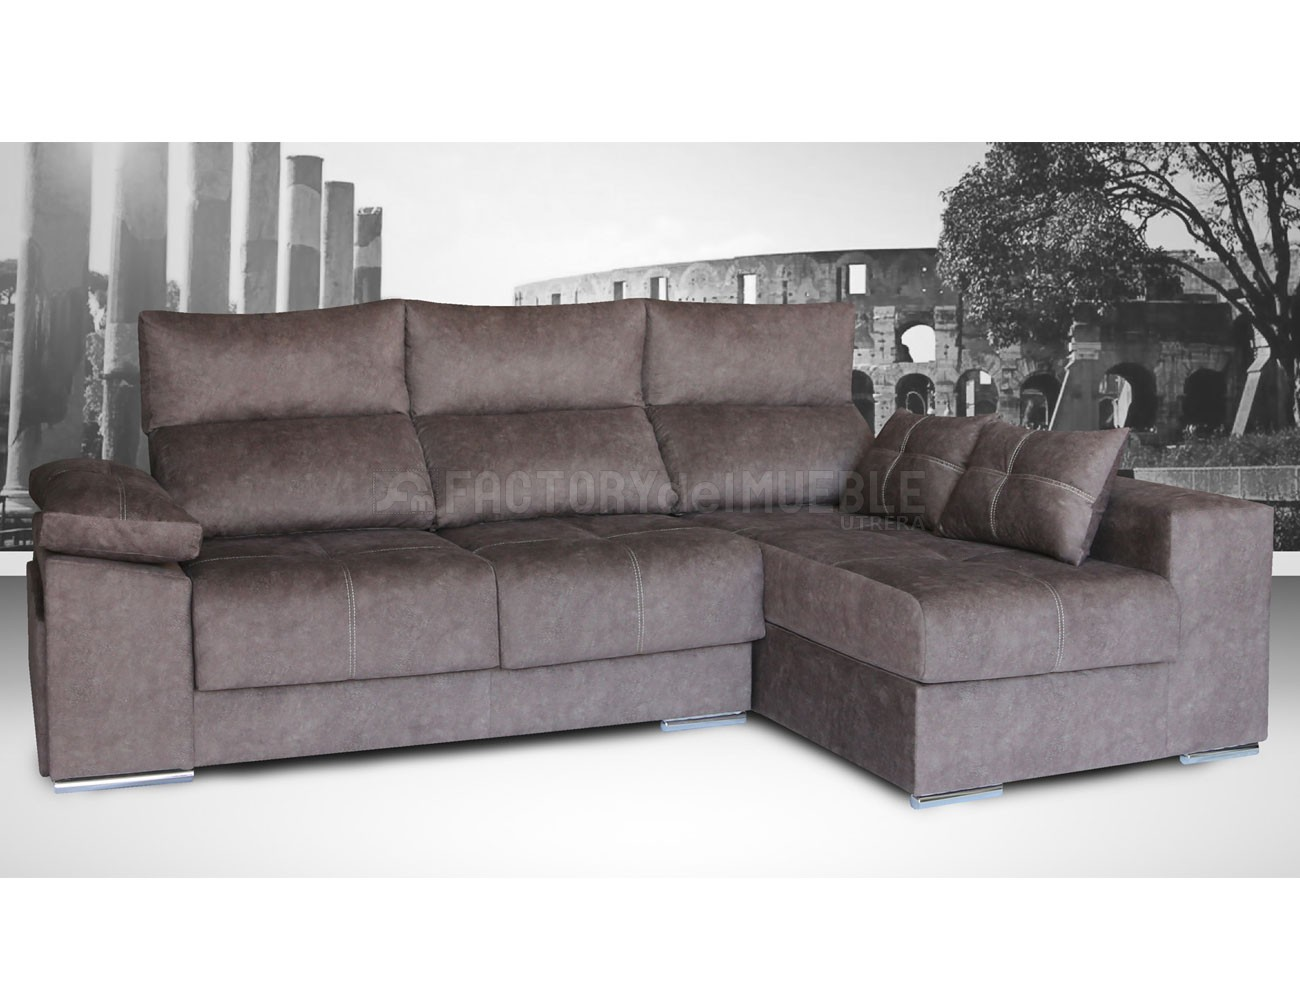 Sofa chaiselongue roma